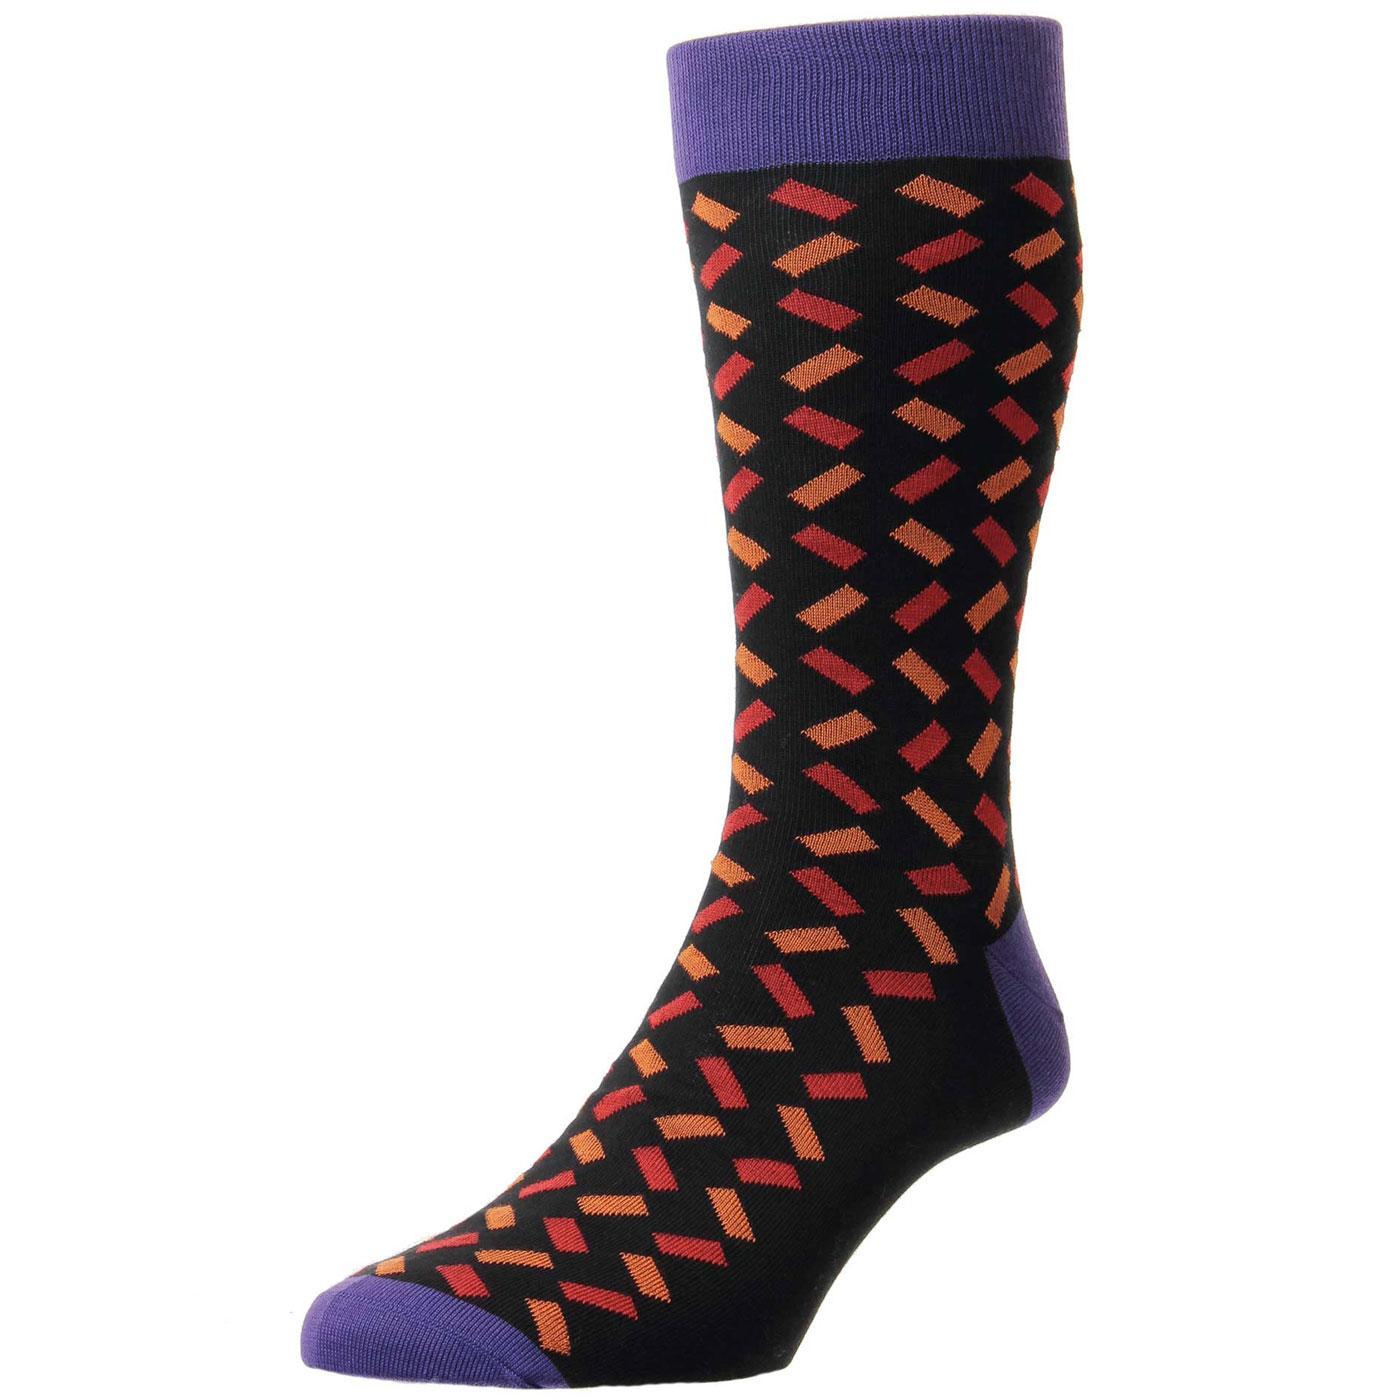 + Allen PANTHERELLA Men's Retro Pattern Socks